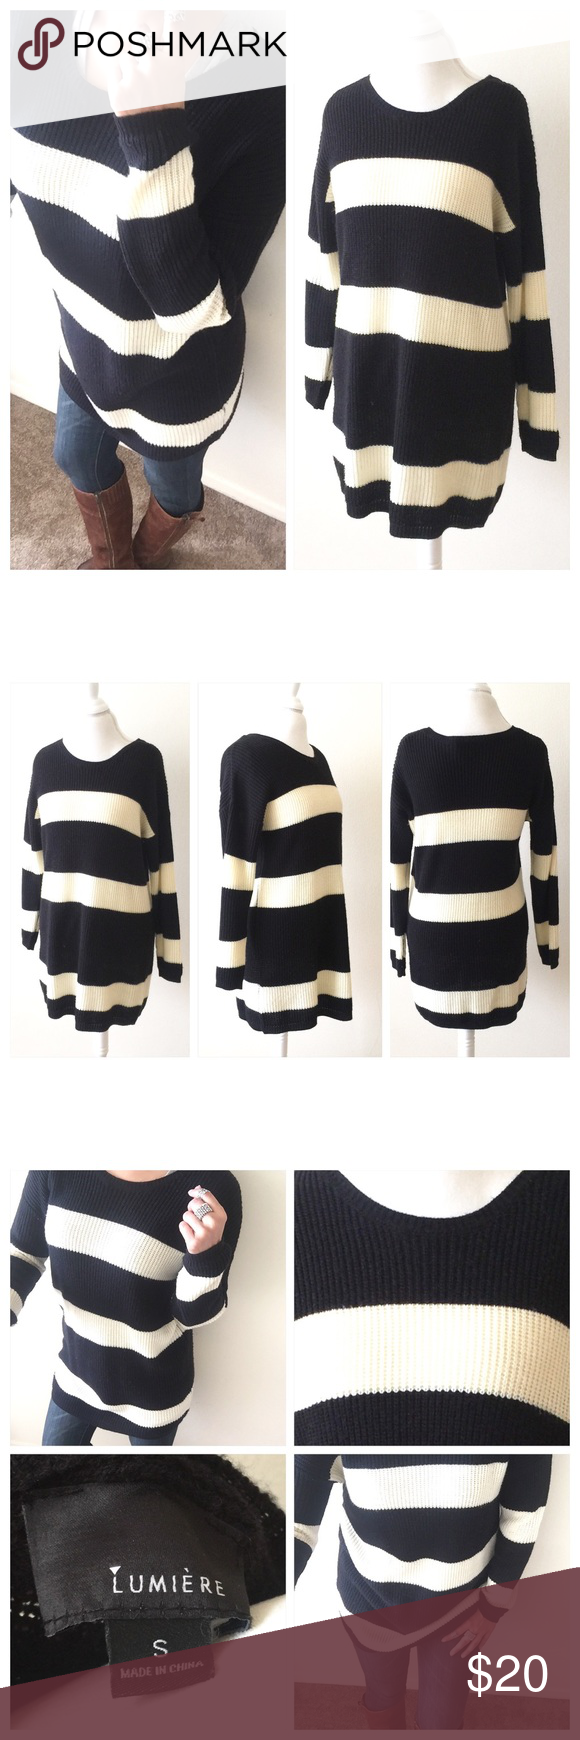 Lumiere Striped Tunic Sweater Top Lumiere Striped Tunic Sweater ...